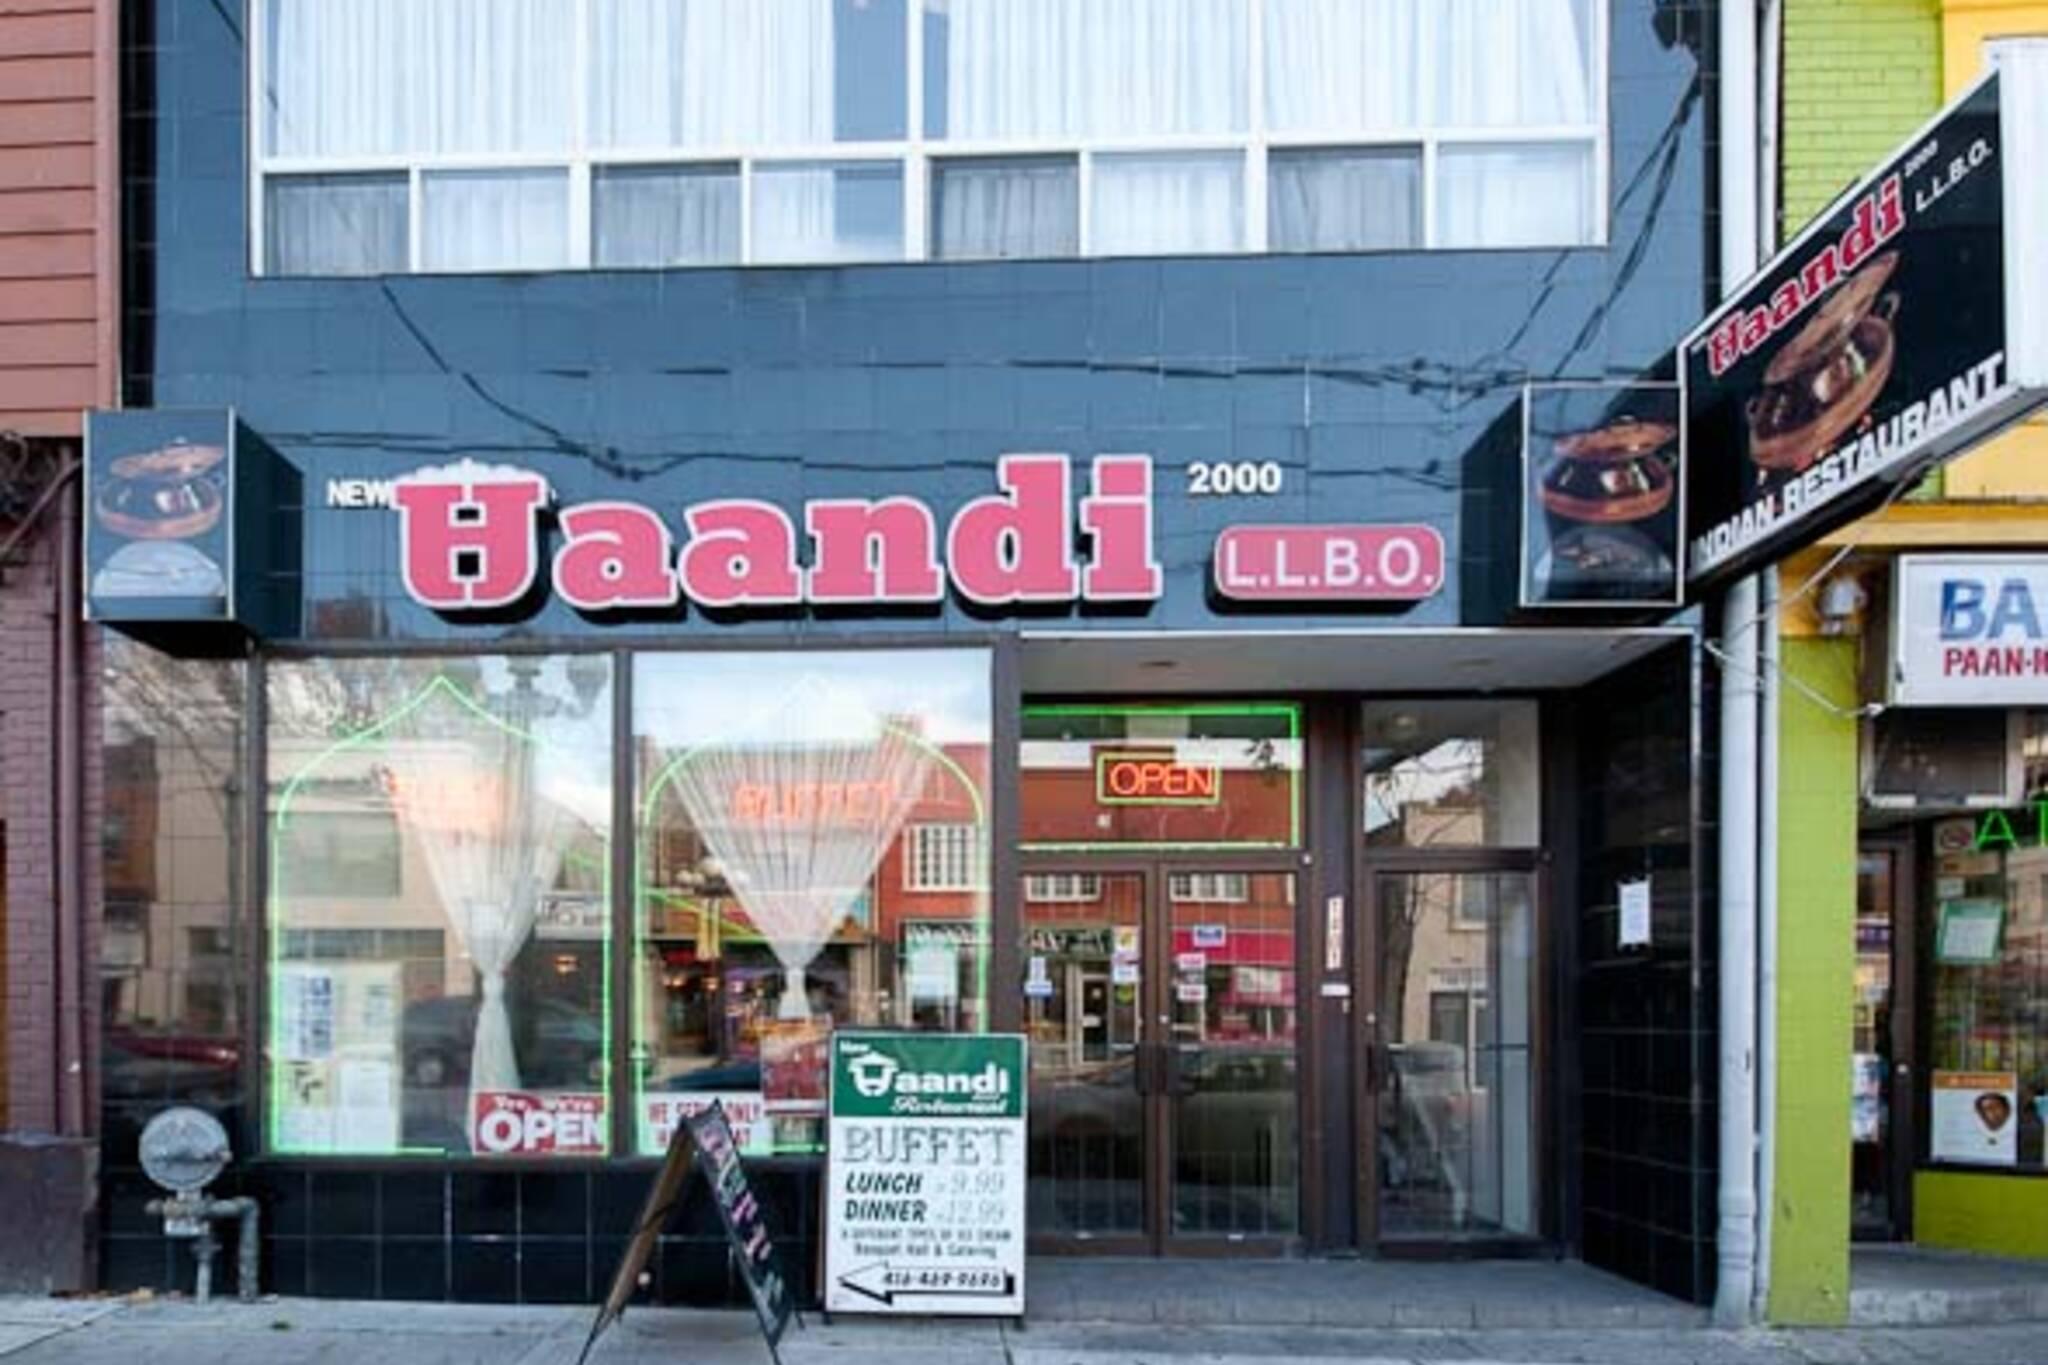 New Haandi 2000